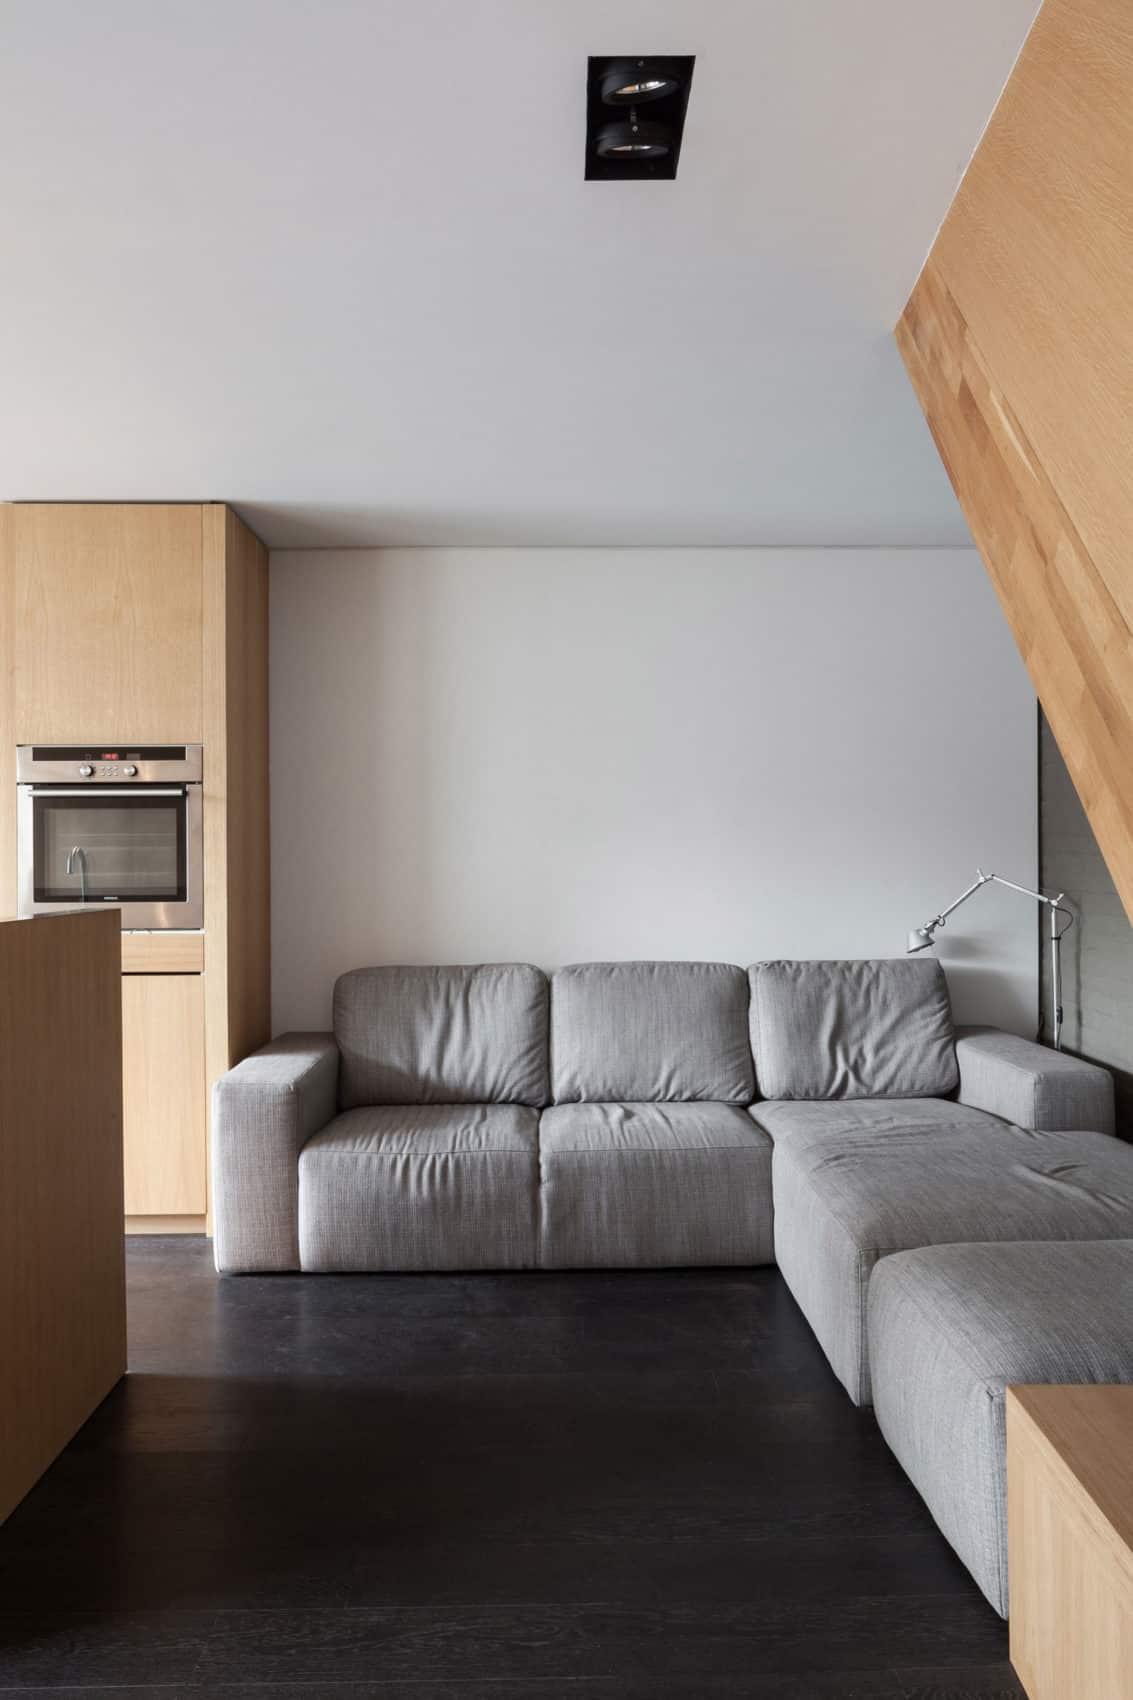 Abeel House by Steven Vandenborre (5)